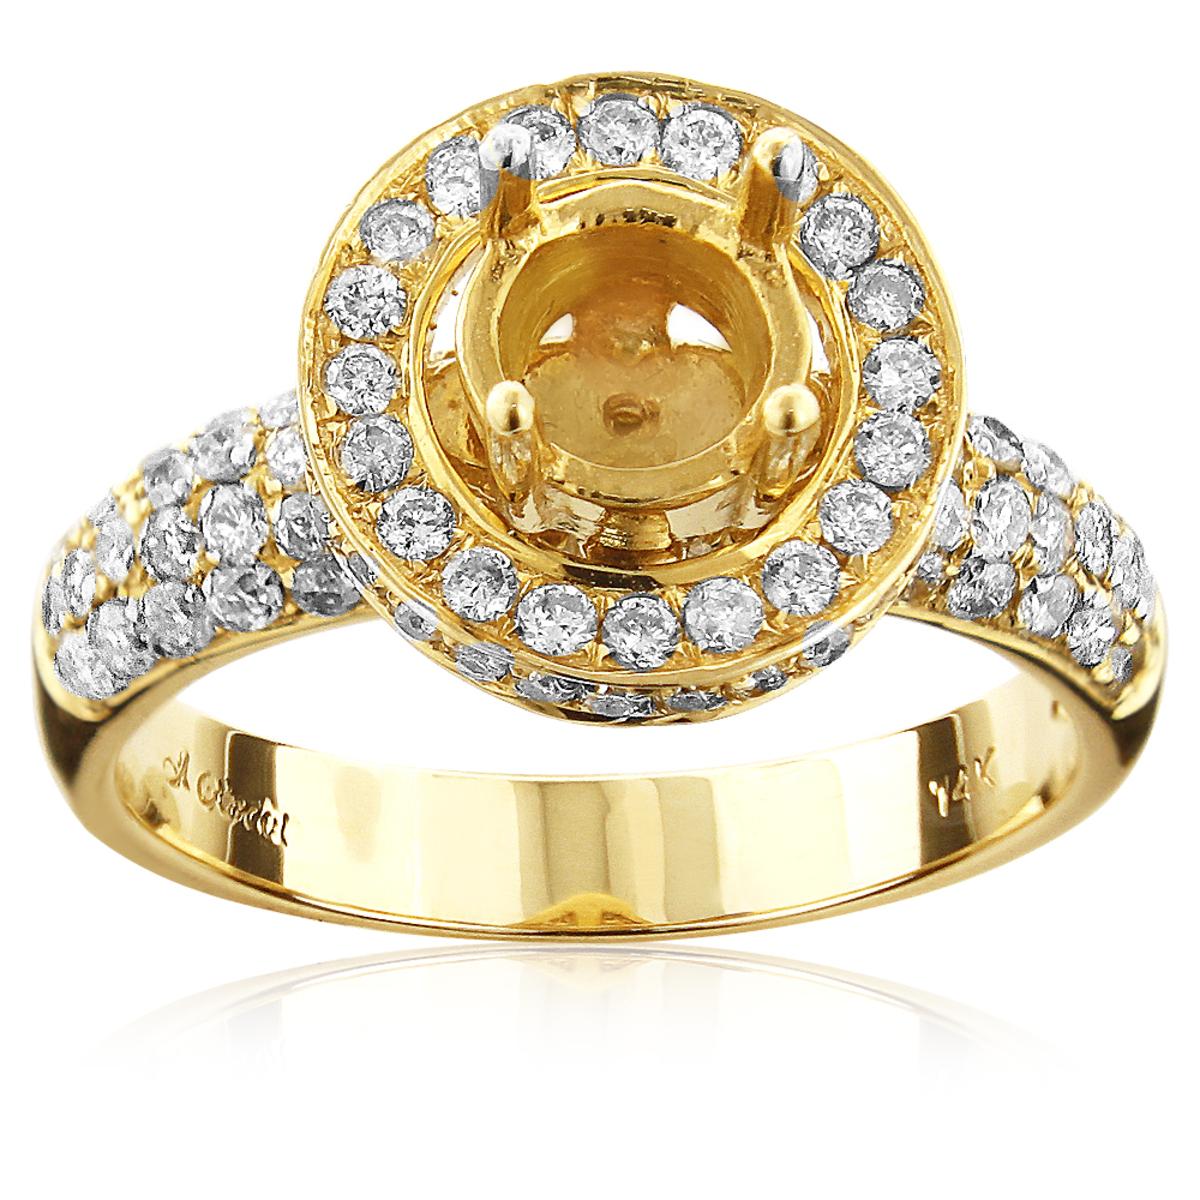 14K Gold Halo Diamond Engagement Ring Mounting 1.33ct